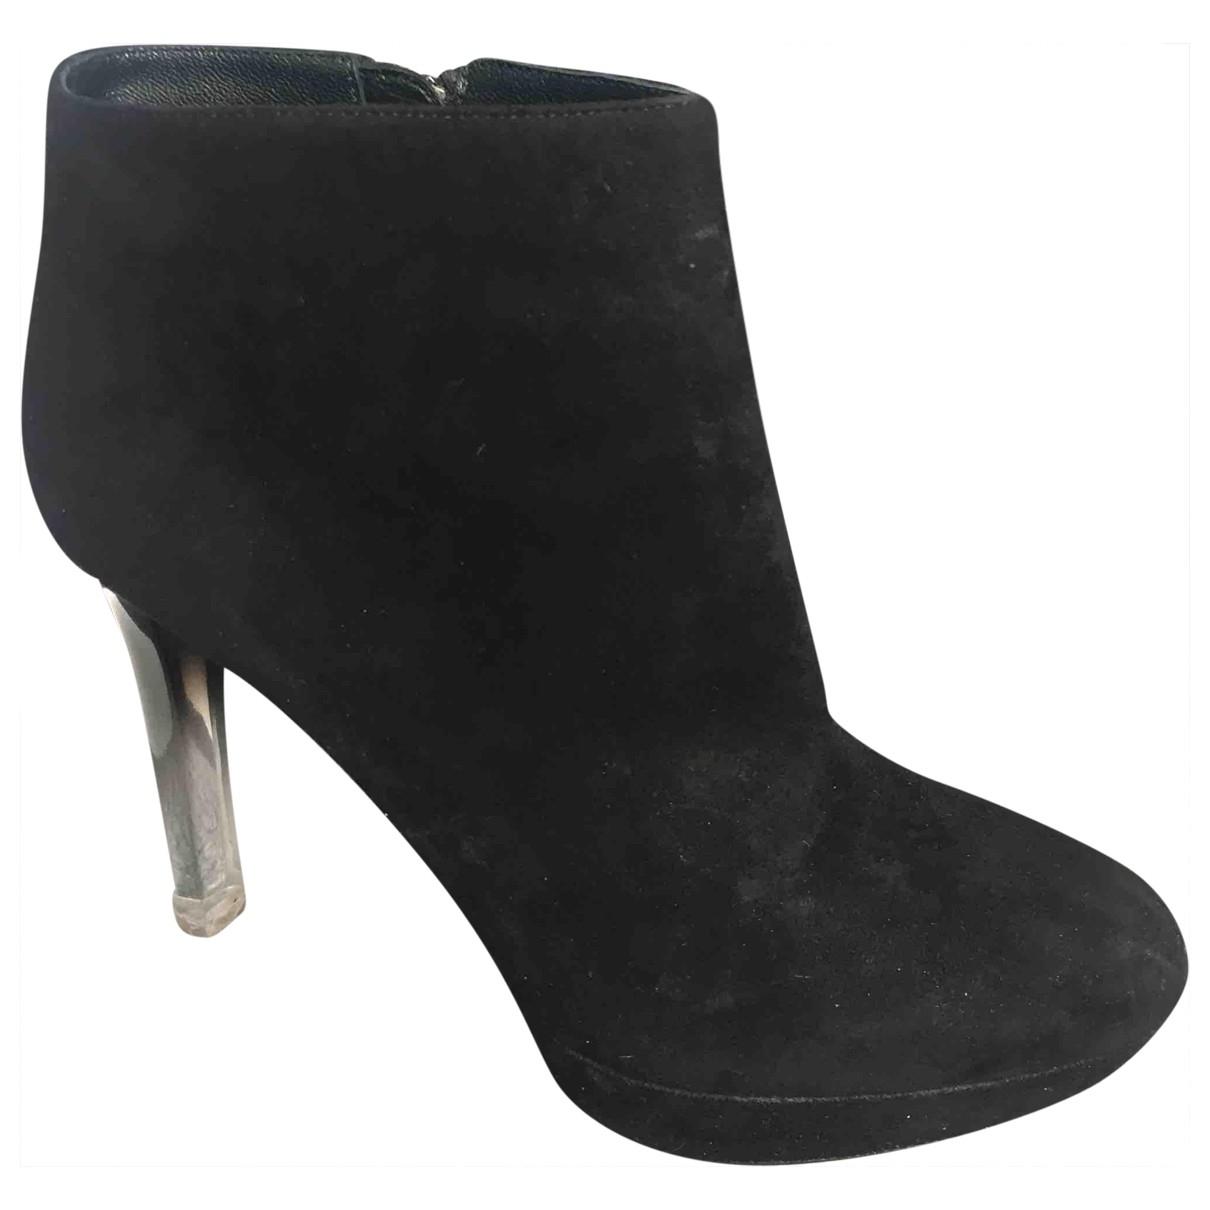 Alexander Mcqueen \N Black Suede Ankle boots for Women 7 UK